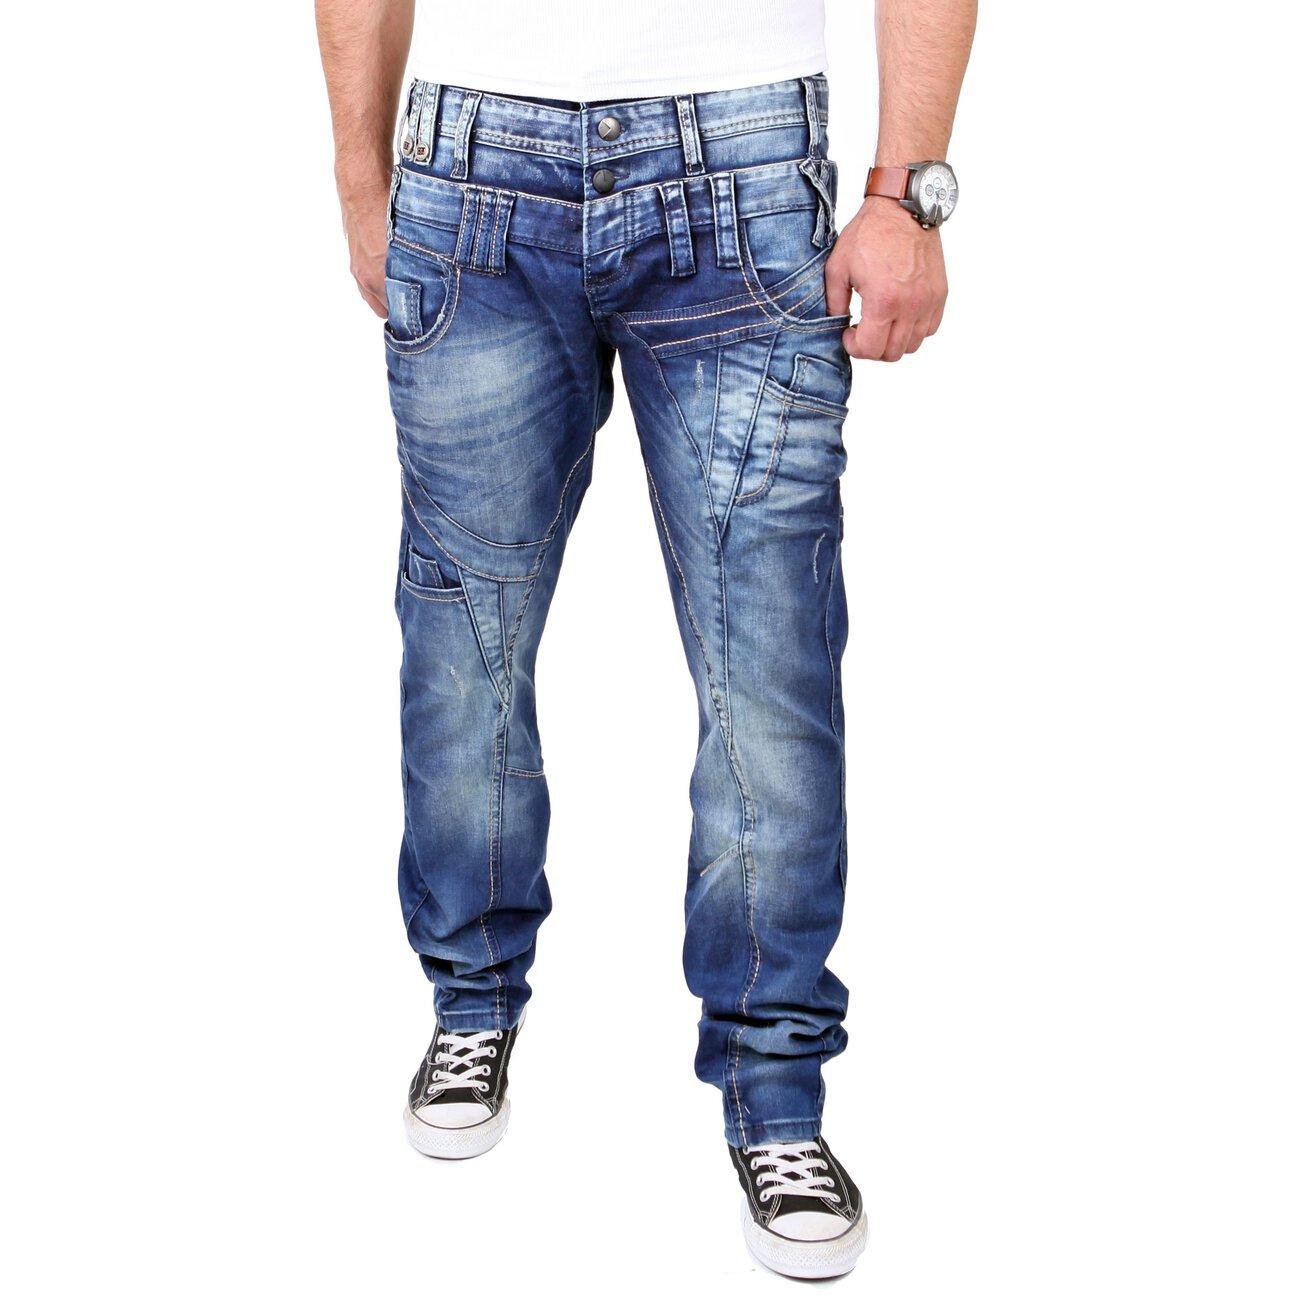 cipo baxx jeans dreifach bund regular fit c 1180 blau. Black Bedroom Furniture Sets. Home Design Ideas